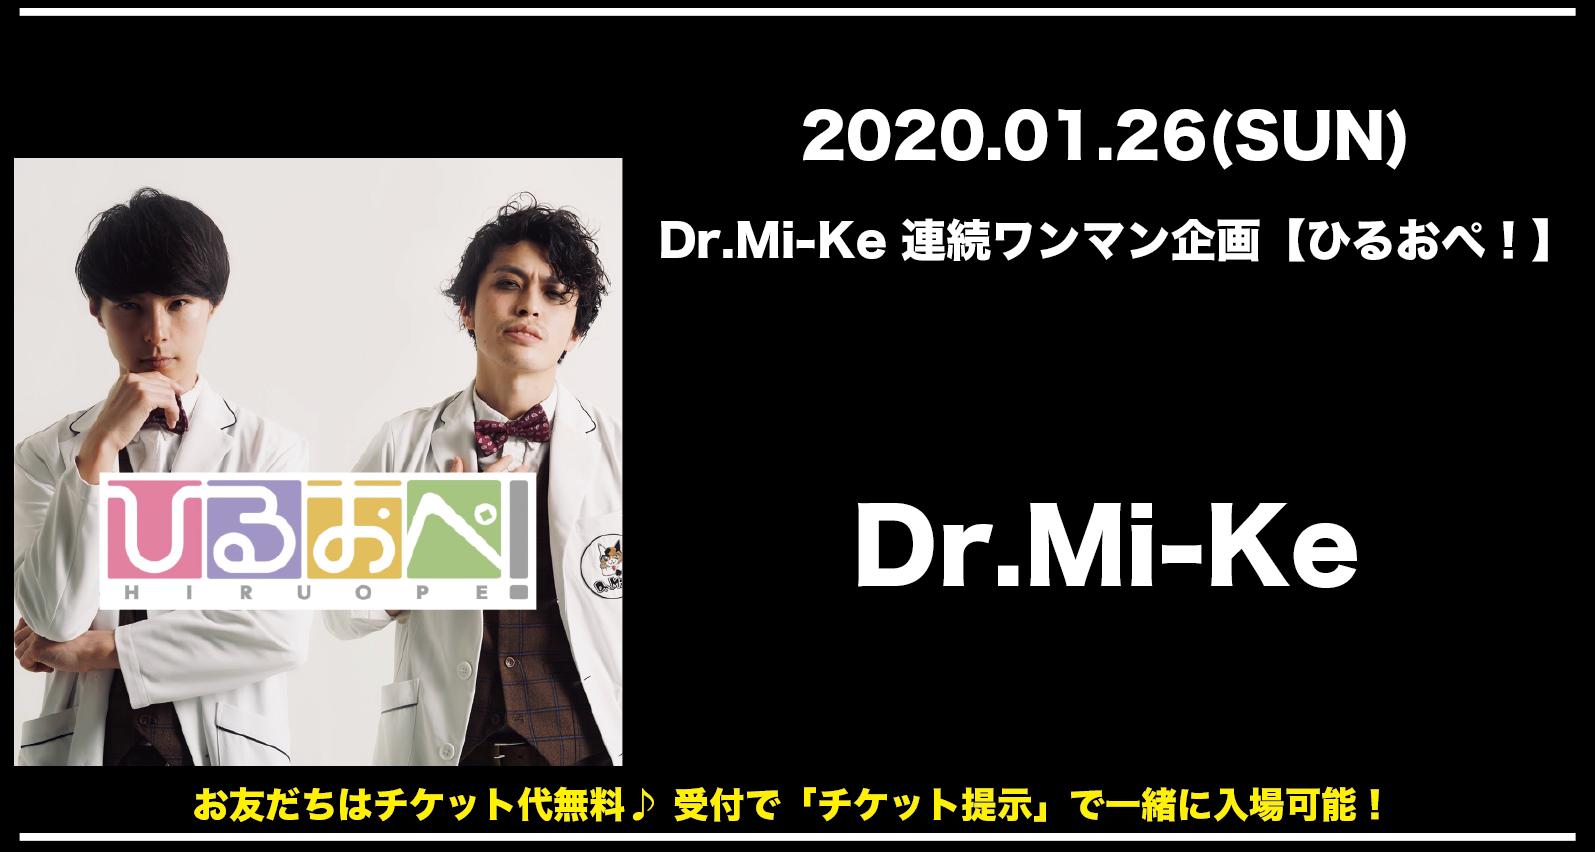 Dr.Mi-Ke 連続ワンマン企画【ひるおぺ!】